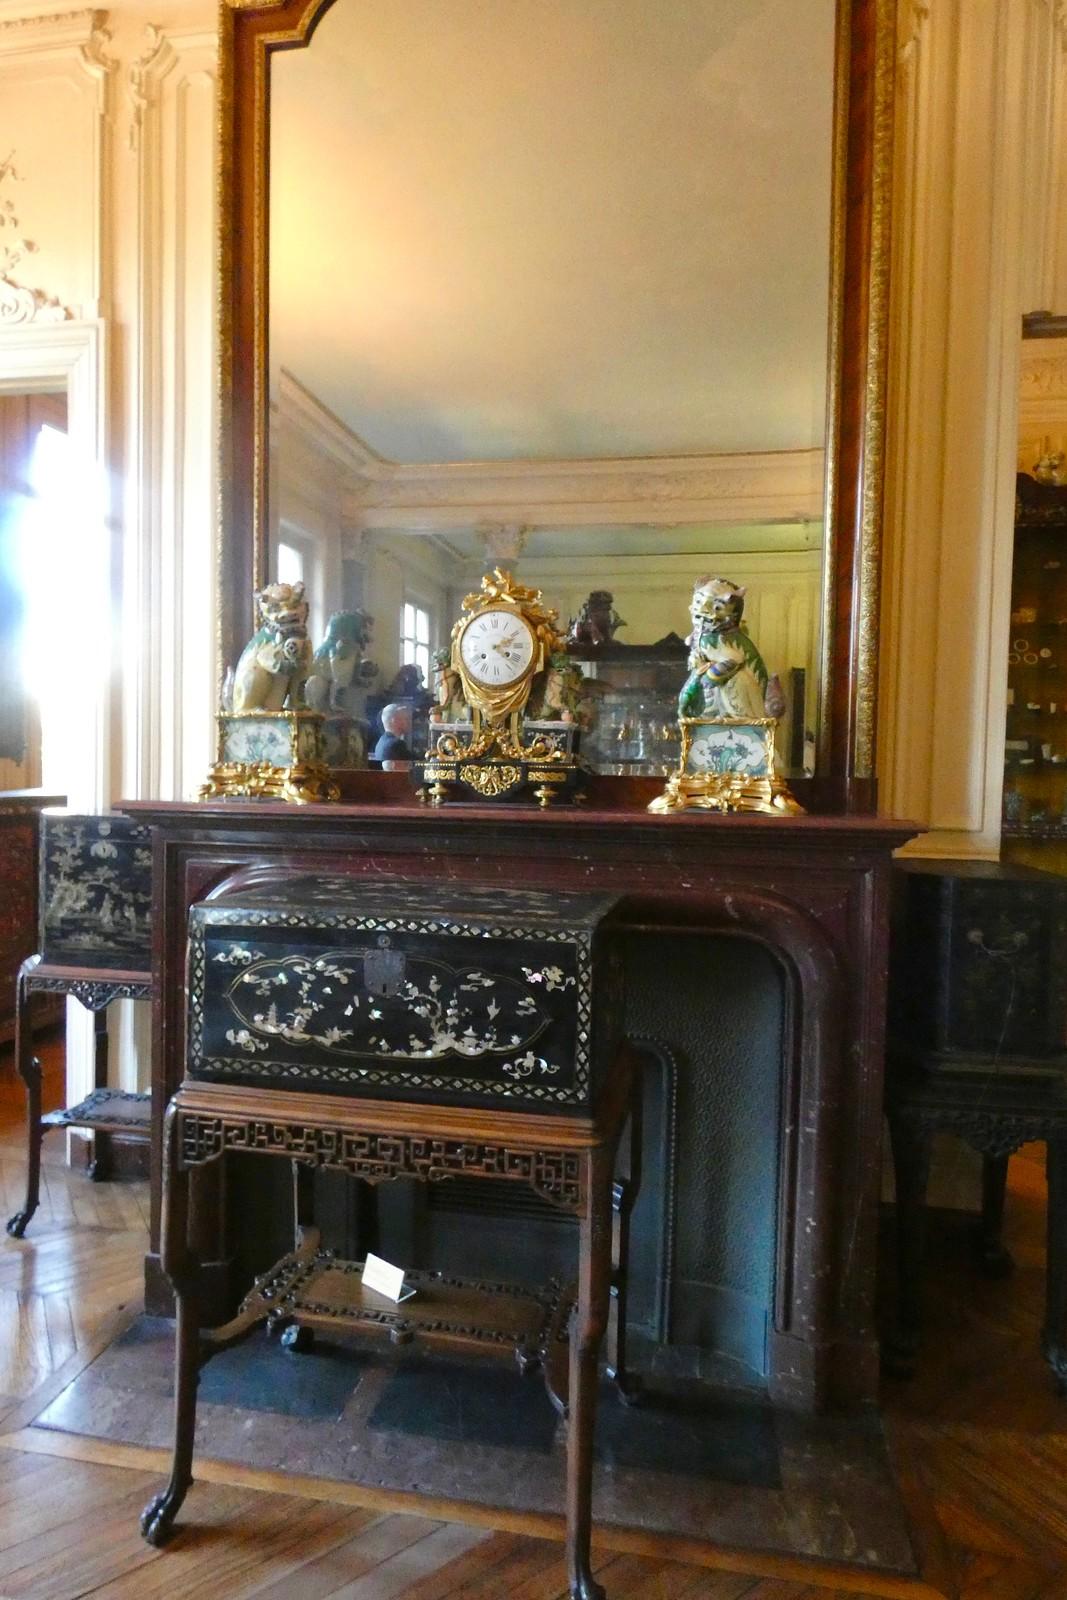 Musée d'Ennery, Paris